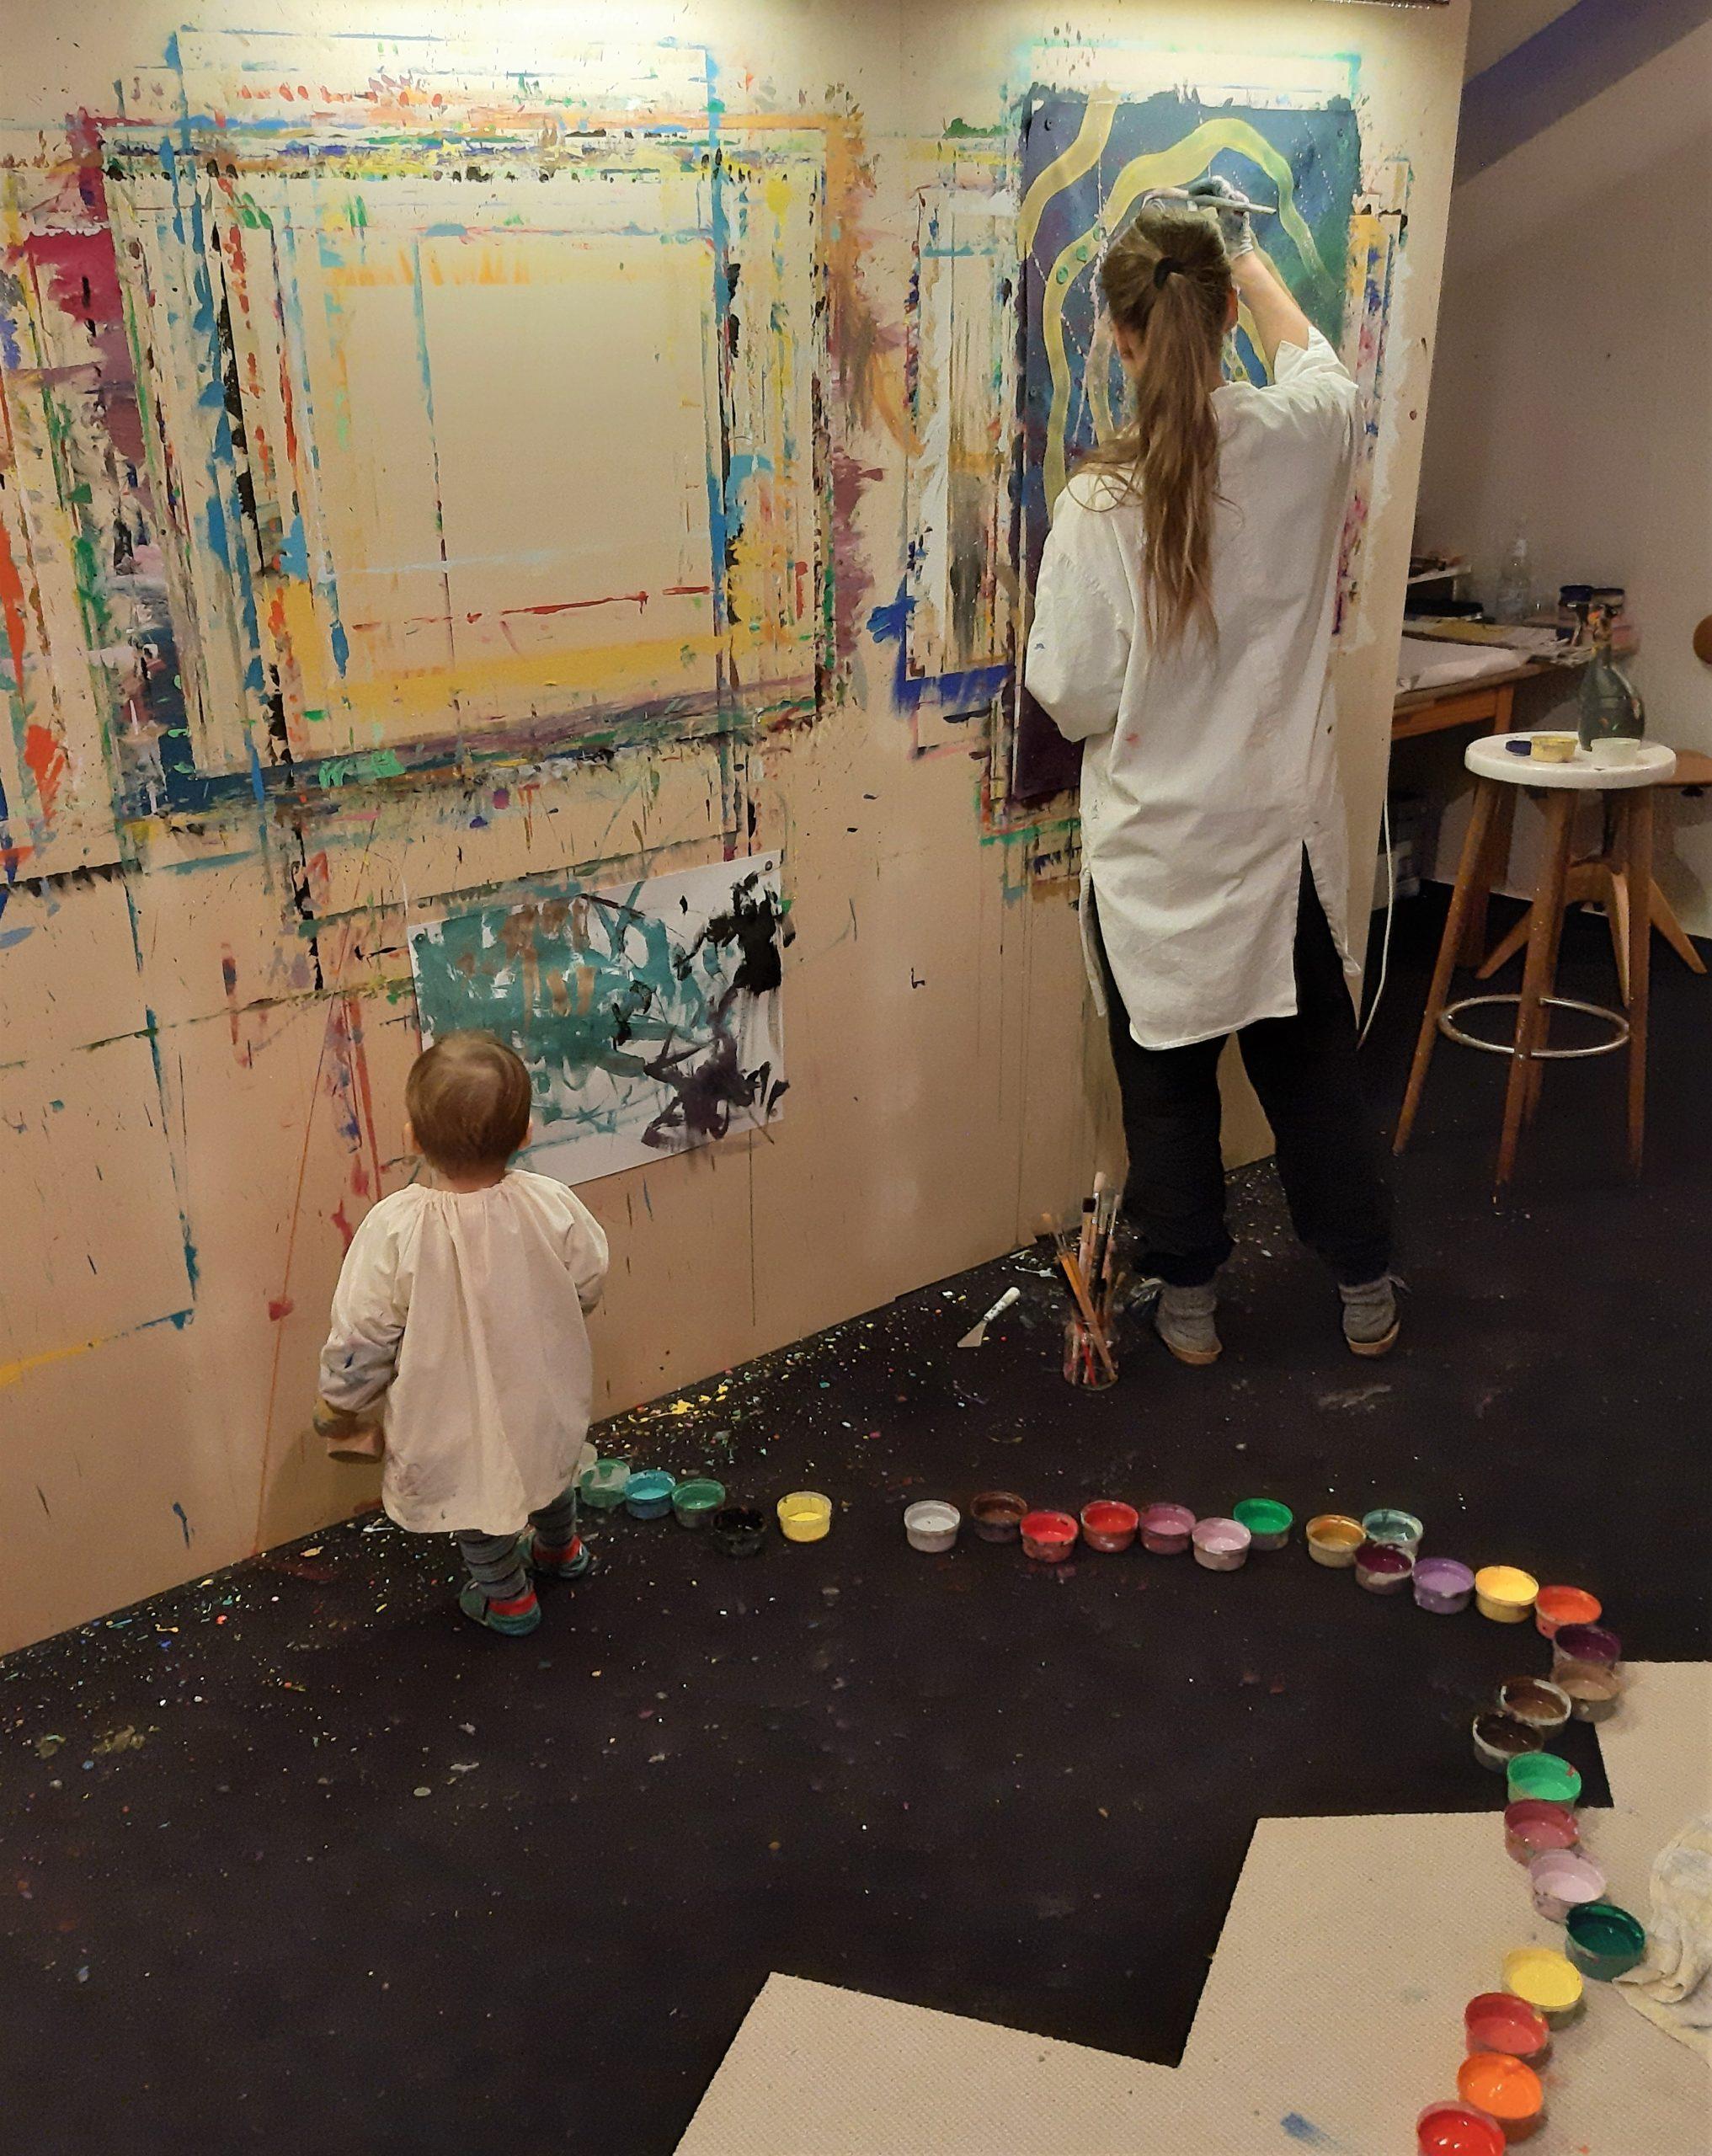 Jacqueline-Kuhn-Atelier-Leben